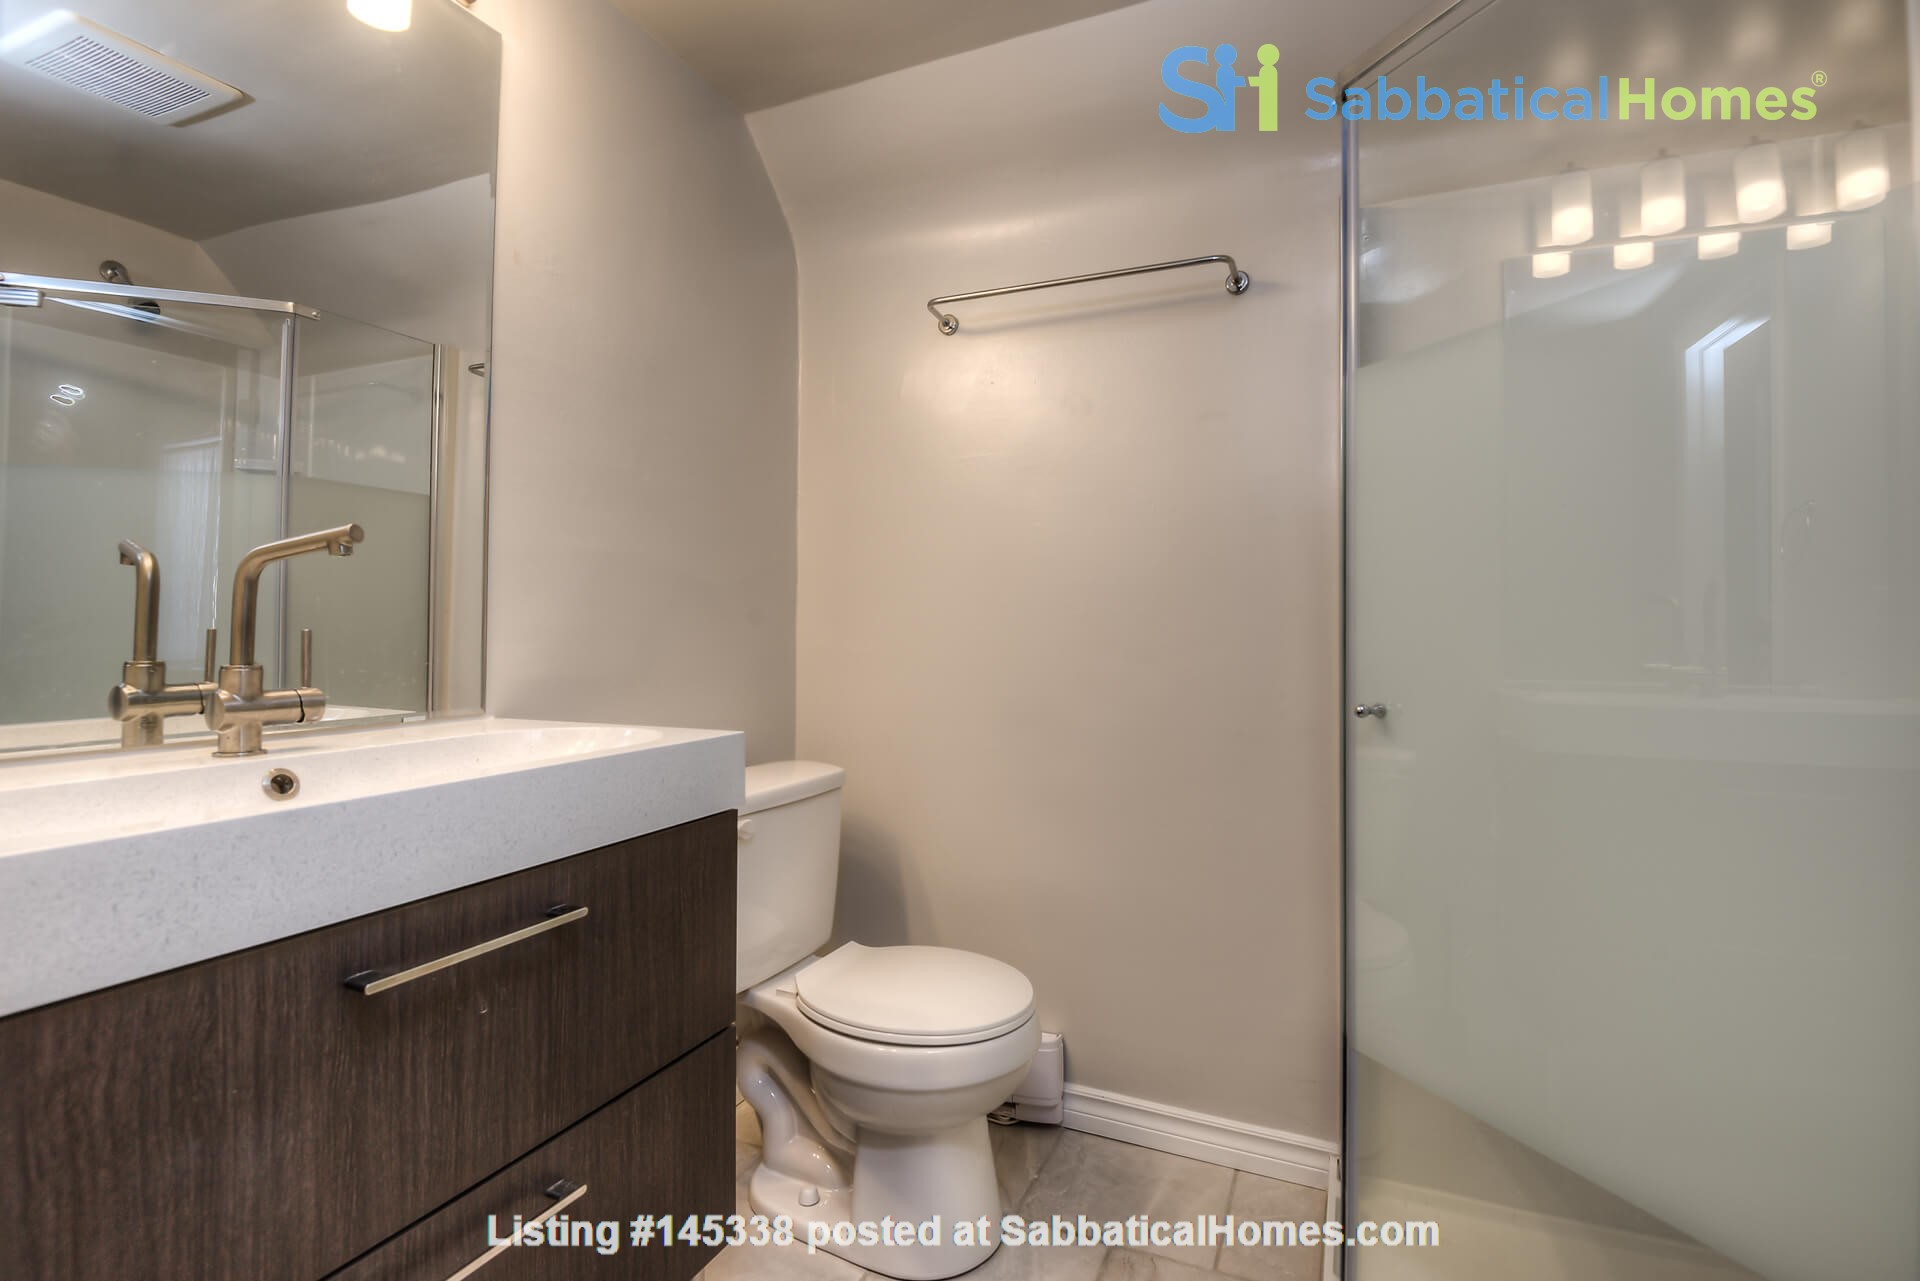 3 bdrm home (unfurnished) - downtown Kitchener-Waterloo Home Rental in Kitchener, Ontario, Canada 5